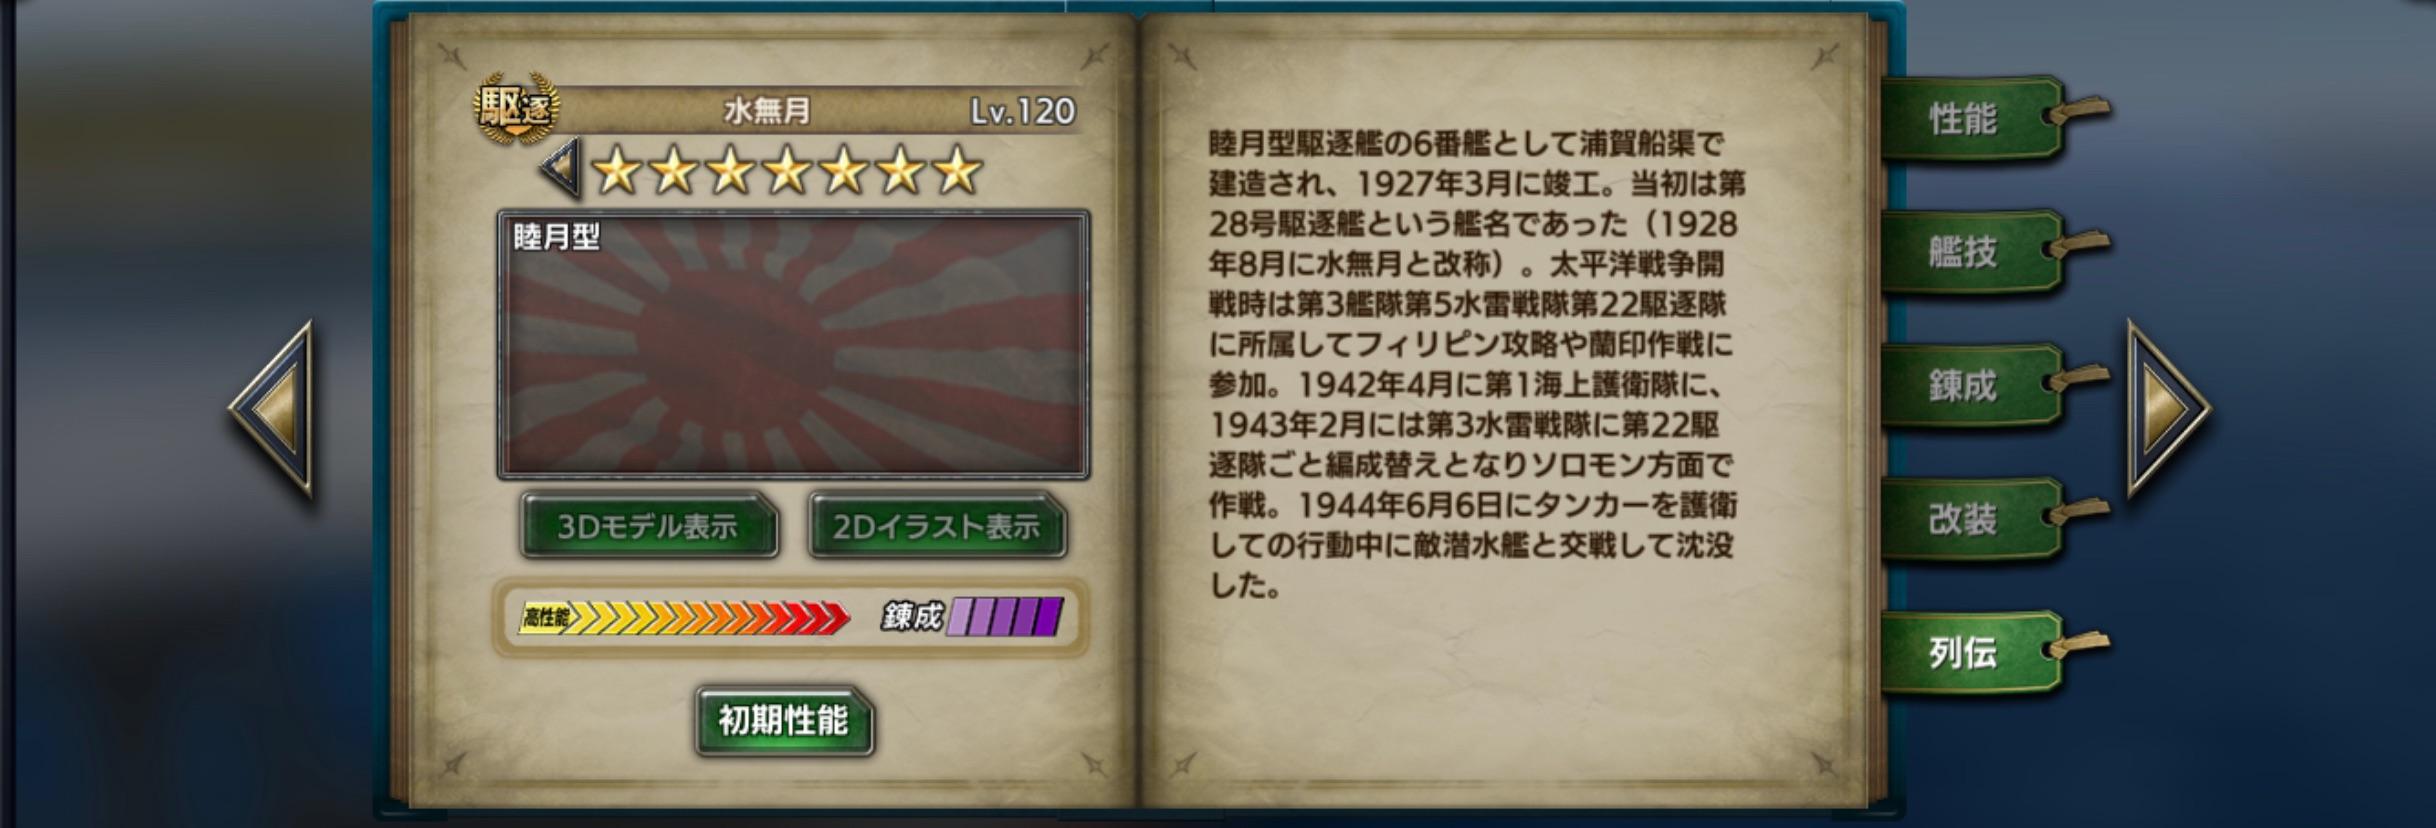 Minadzuki-history